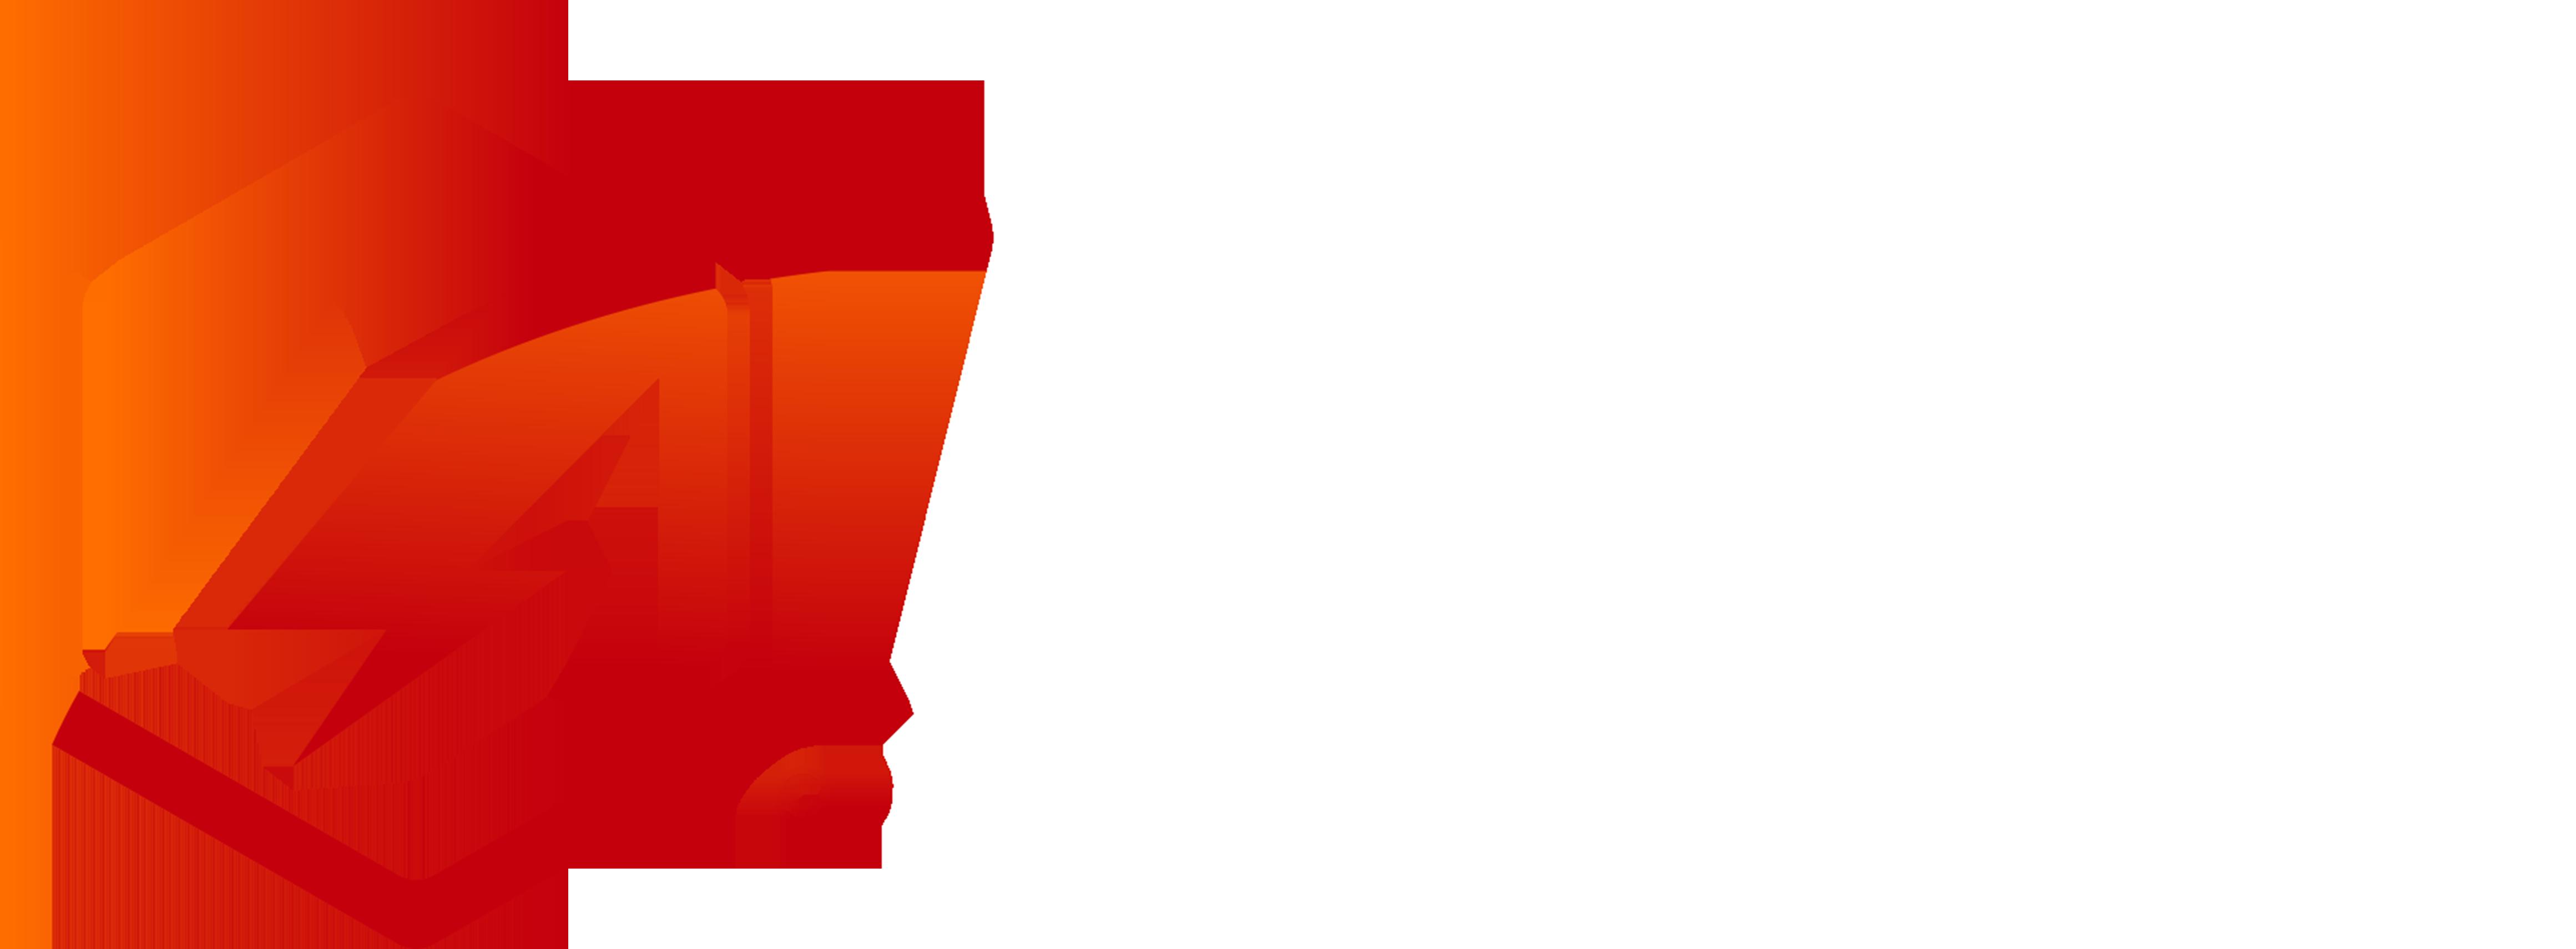 APSC mix 2